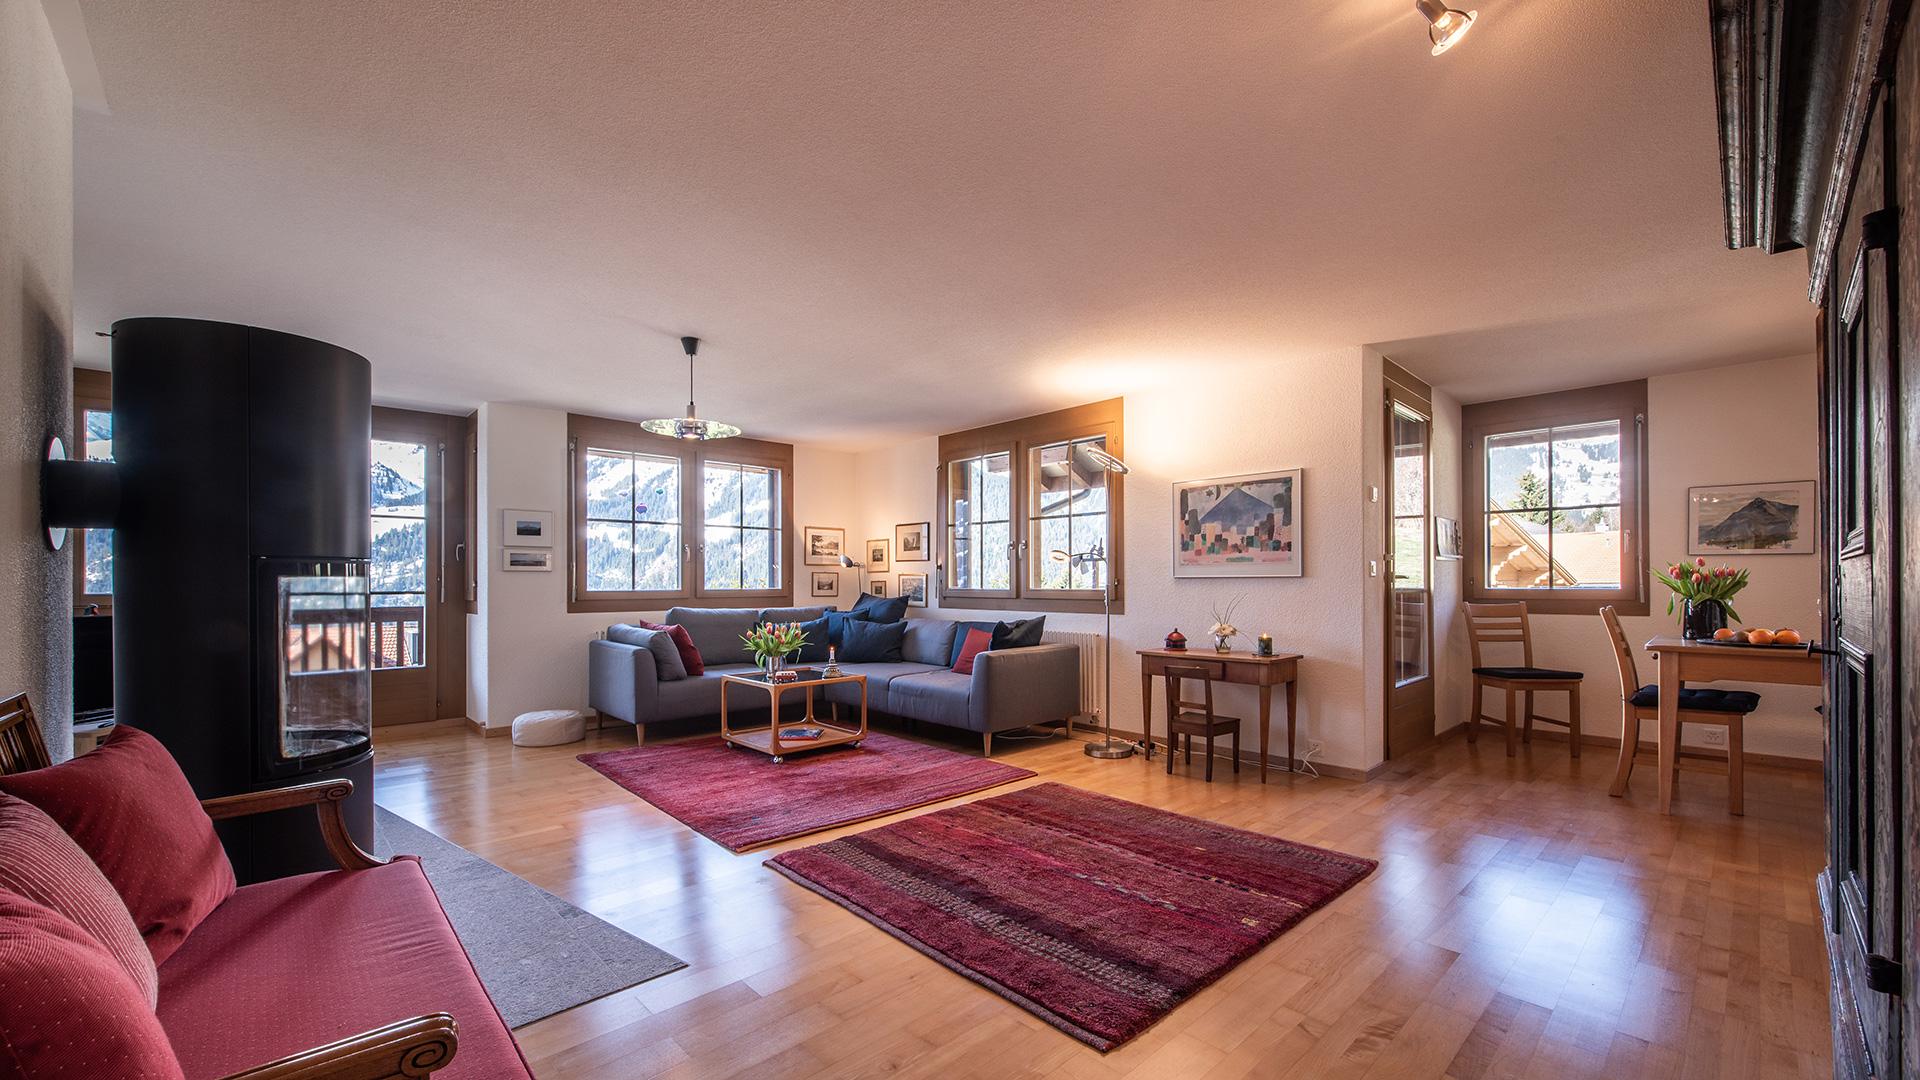 Alpenrebe Apartments, Switzerland